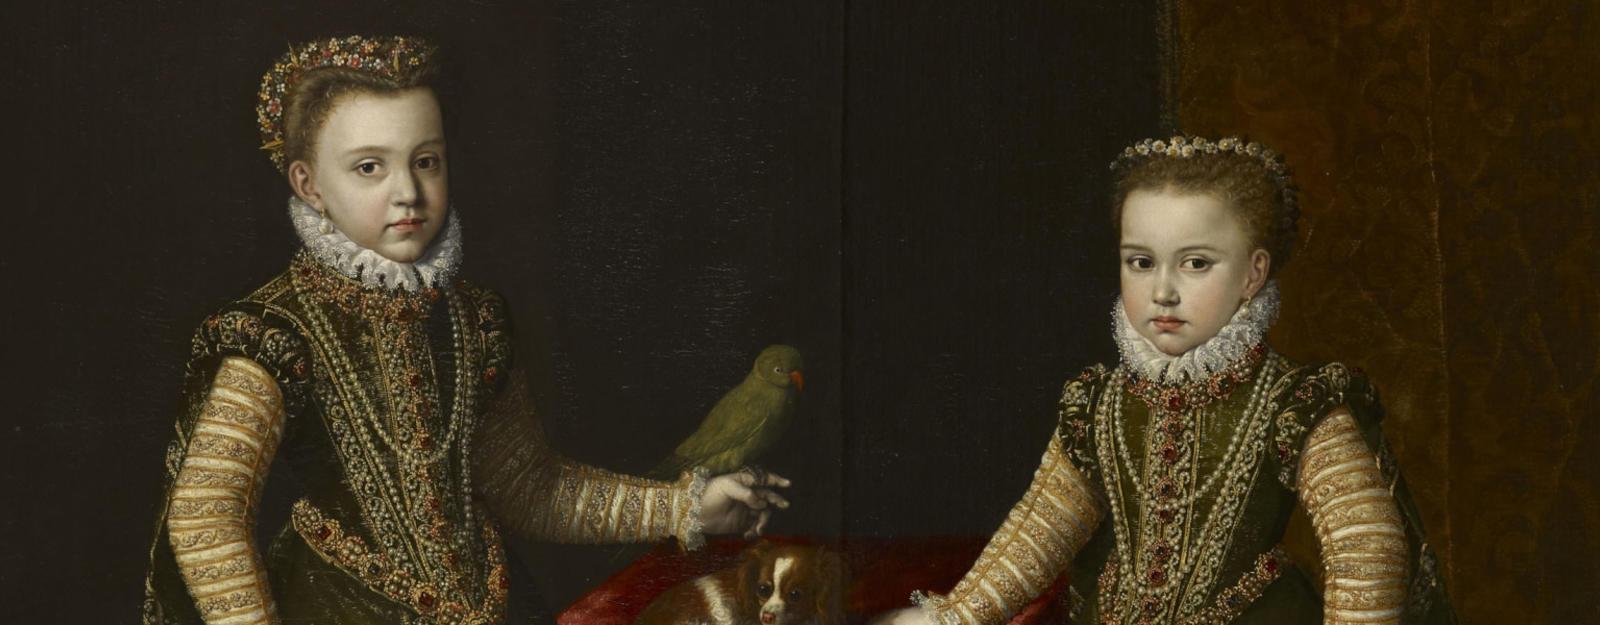 painting of two daughters of Philip II of Spain